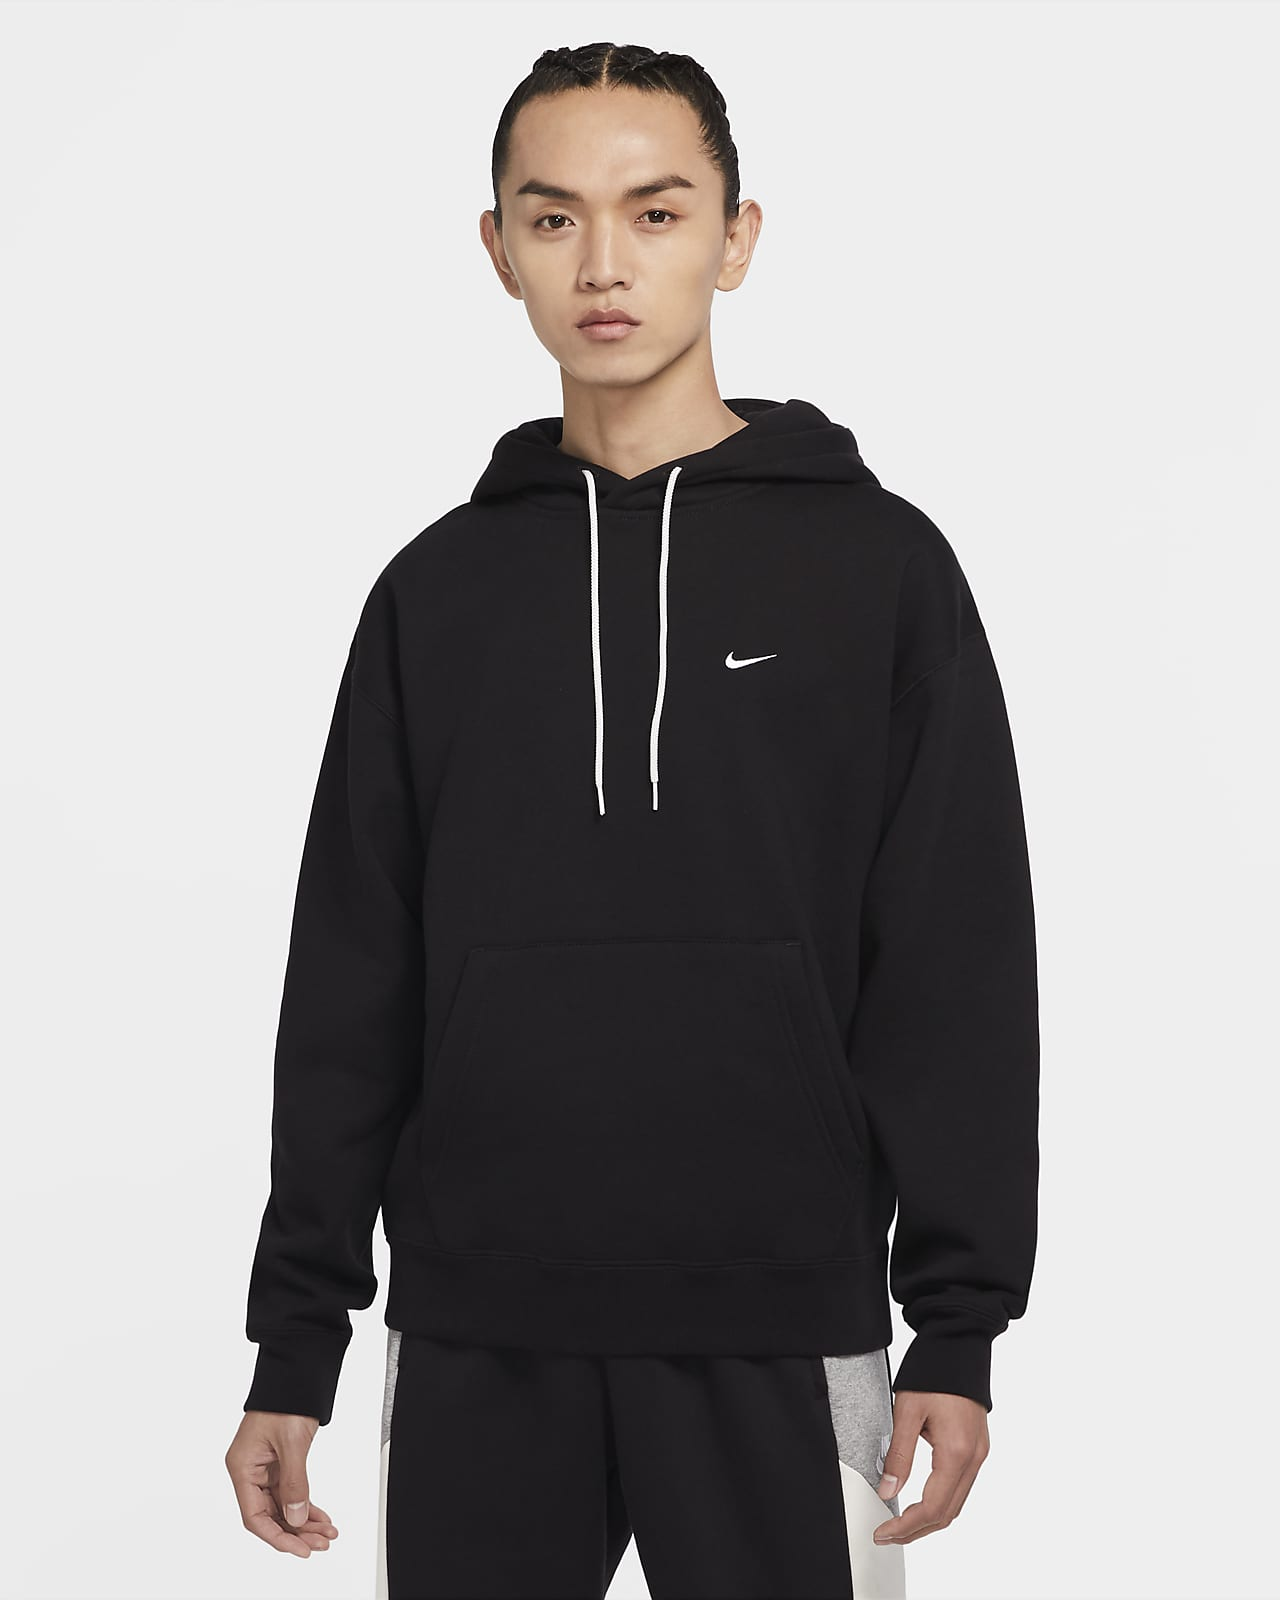 NikeLab 男款 Fleece 連帽上衣